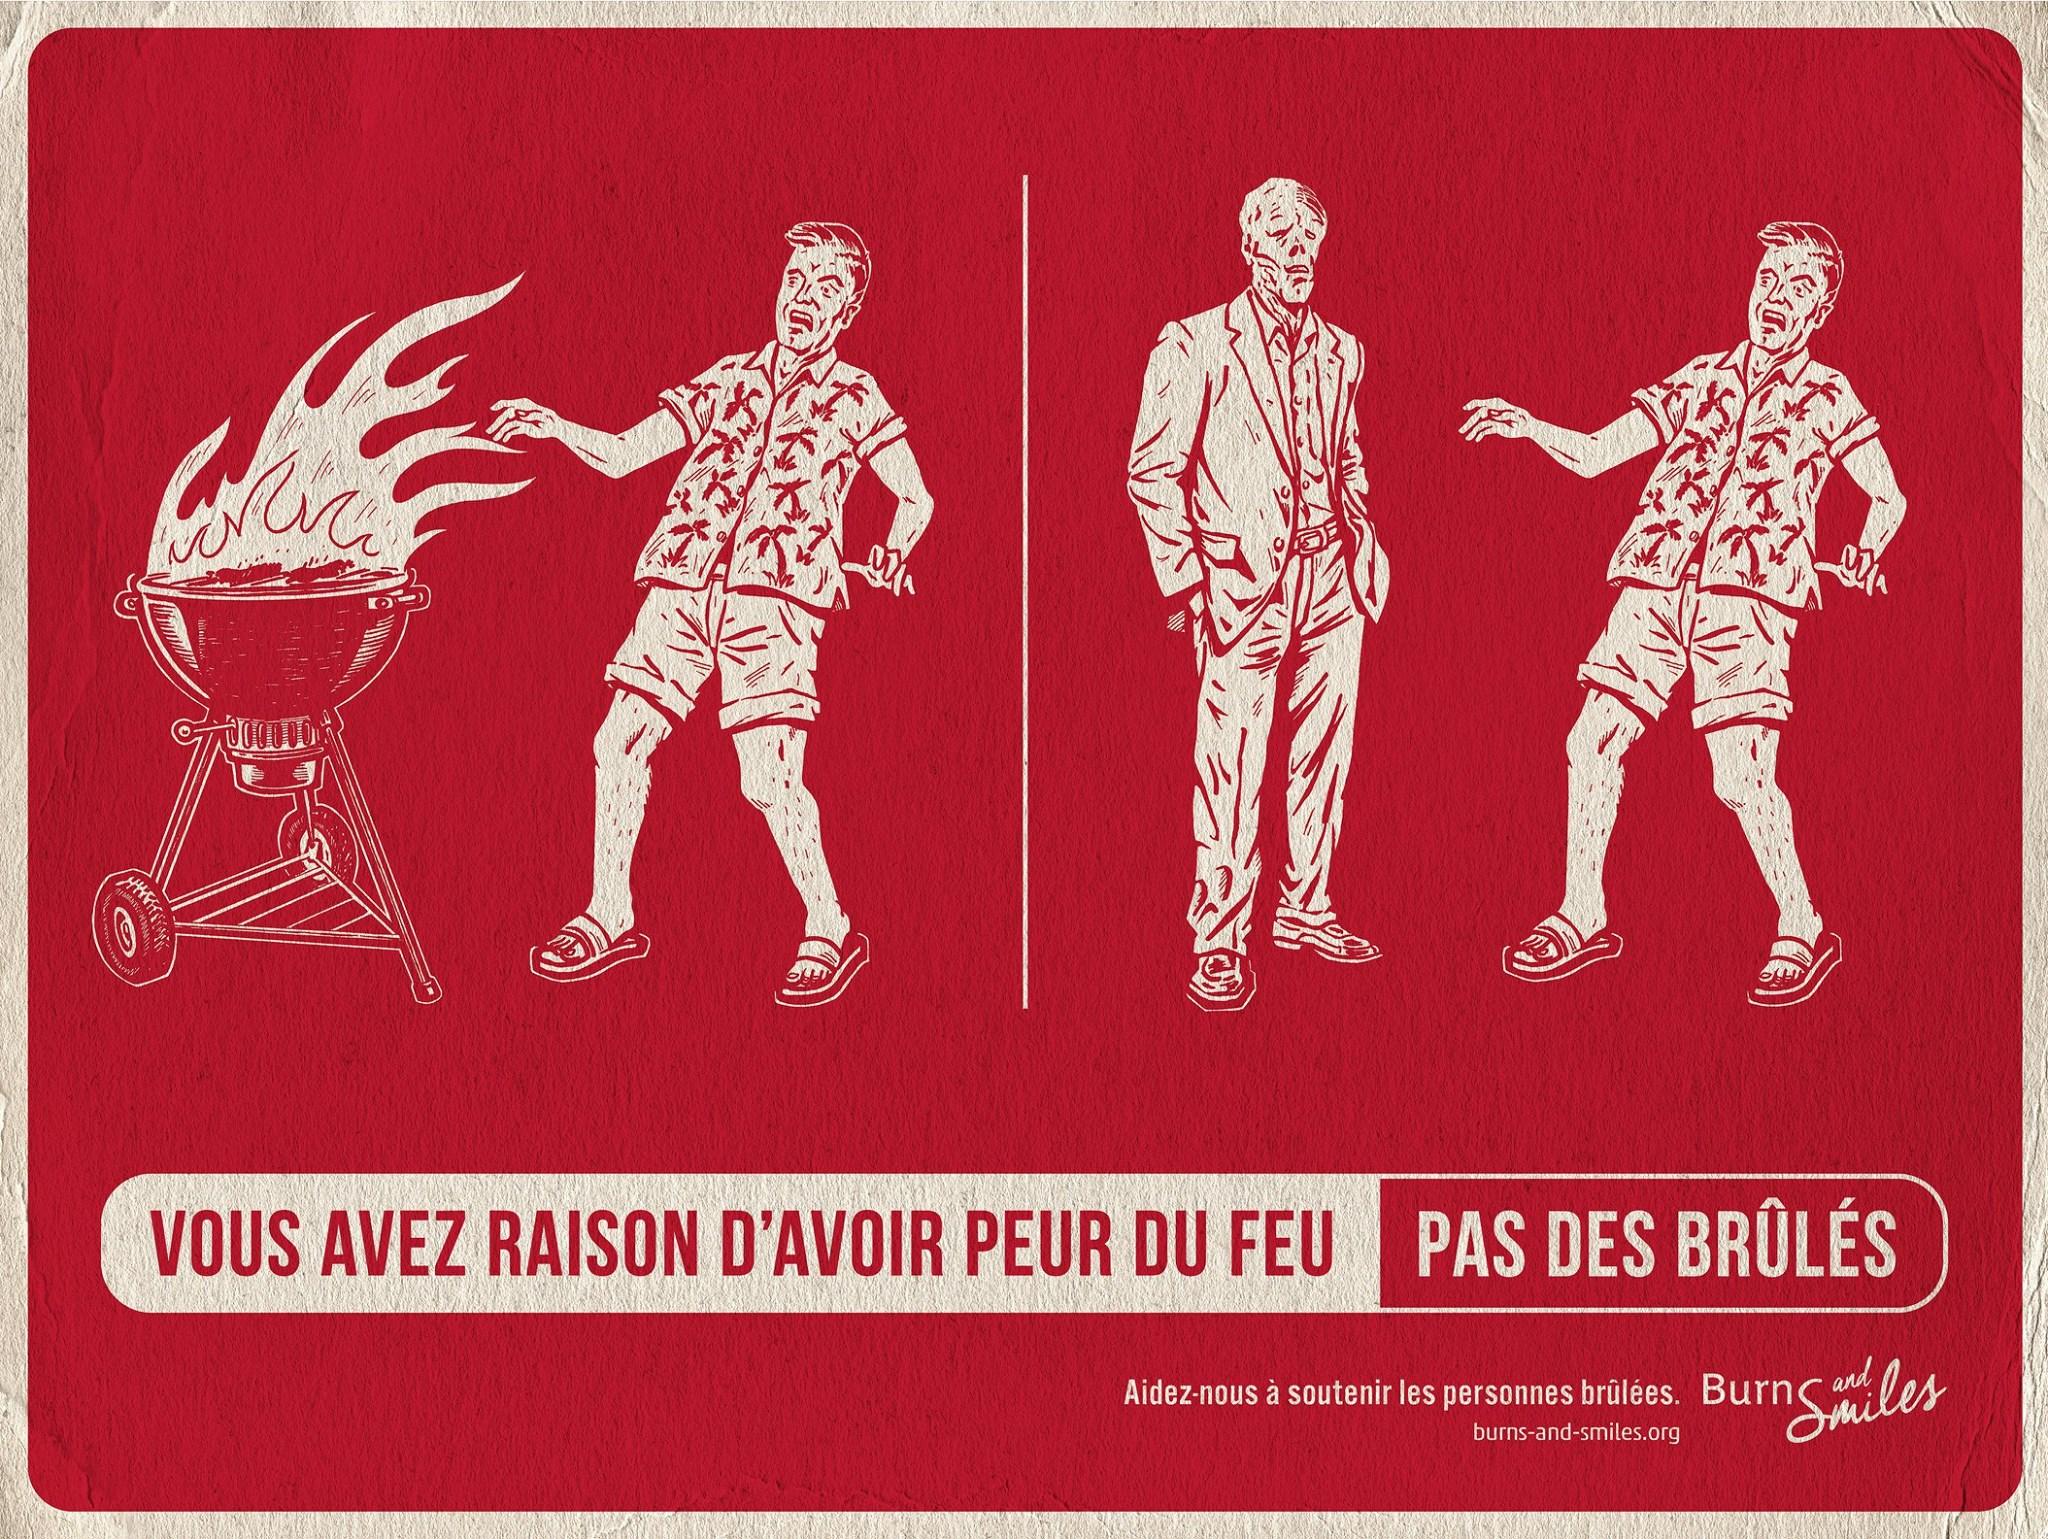 burns-and-smiles-publicite-communication-print-press-ad-feu-brules-burn-agence-tbwa-paris-6